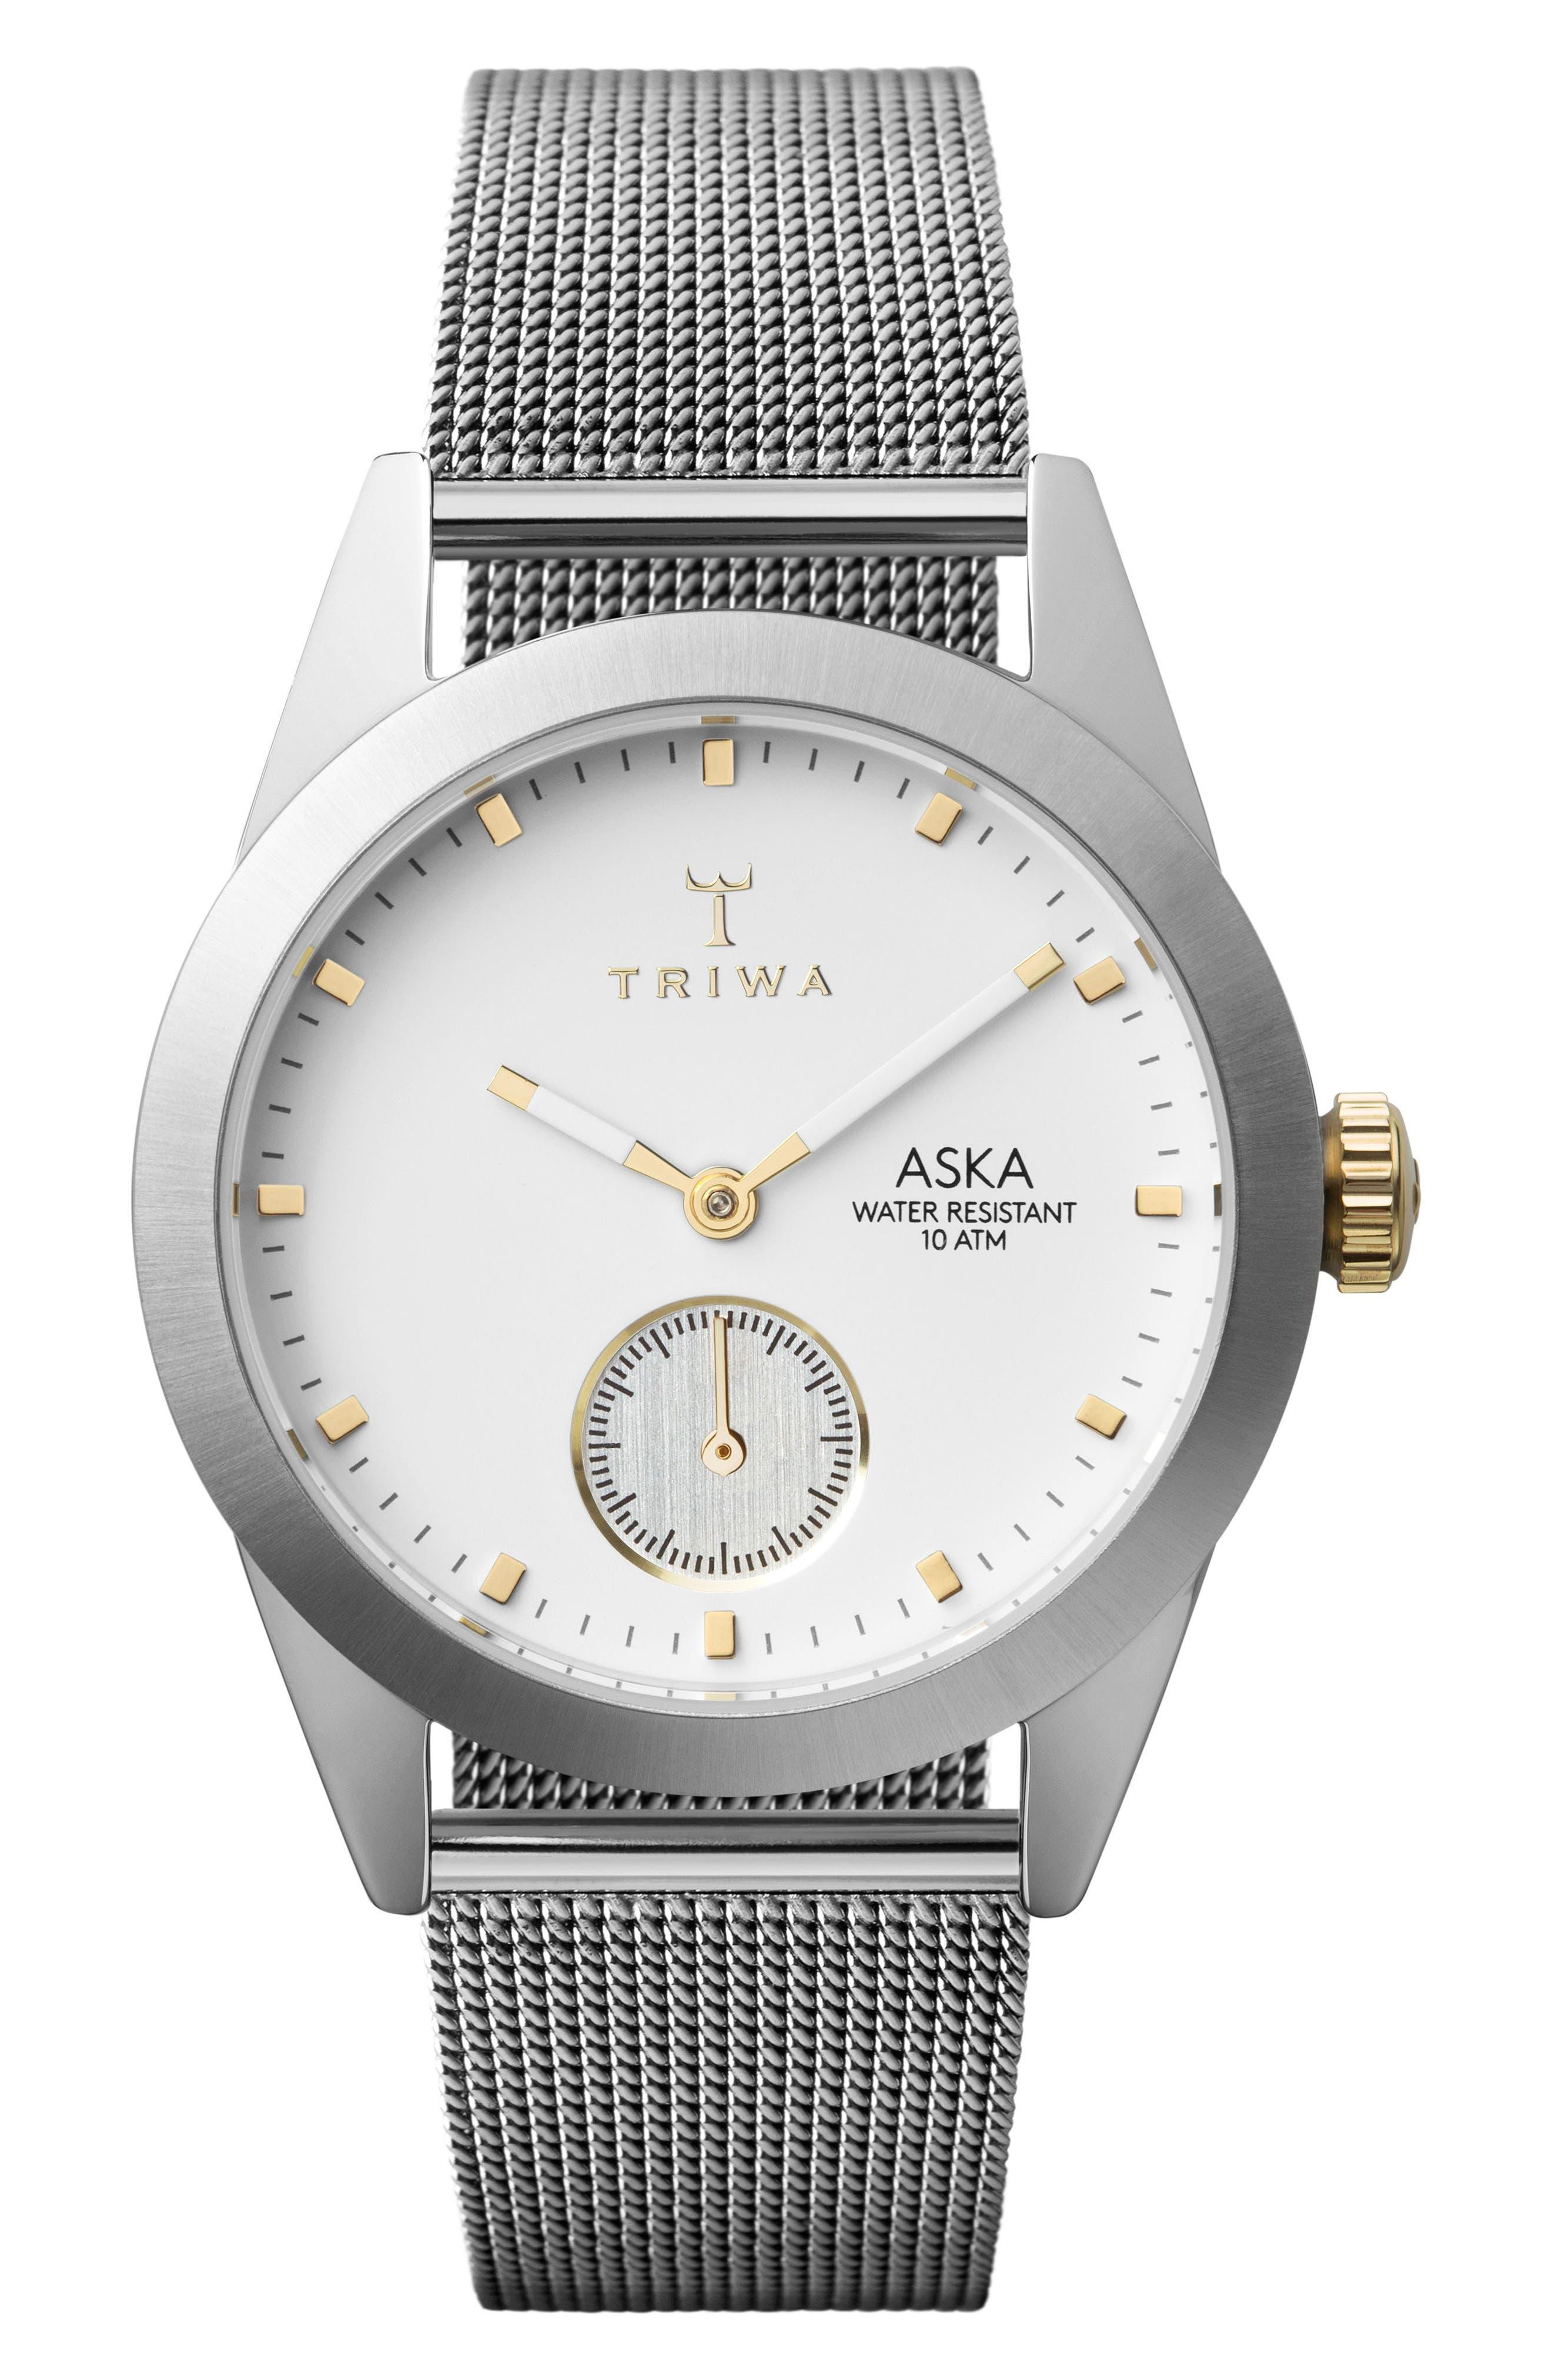 TRIWA Snow Aska Mesh Strap Watch, 32Mm in Silver/ White/ Silver